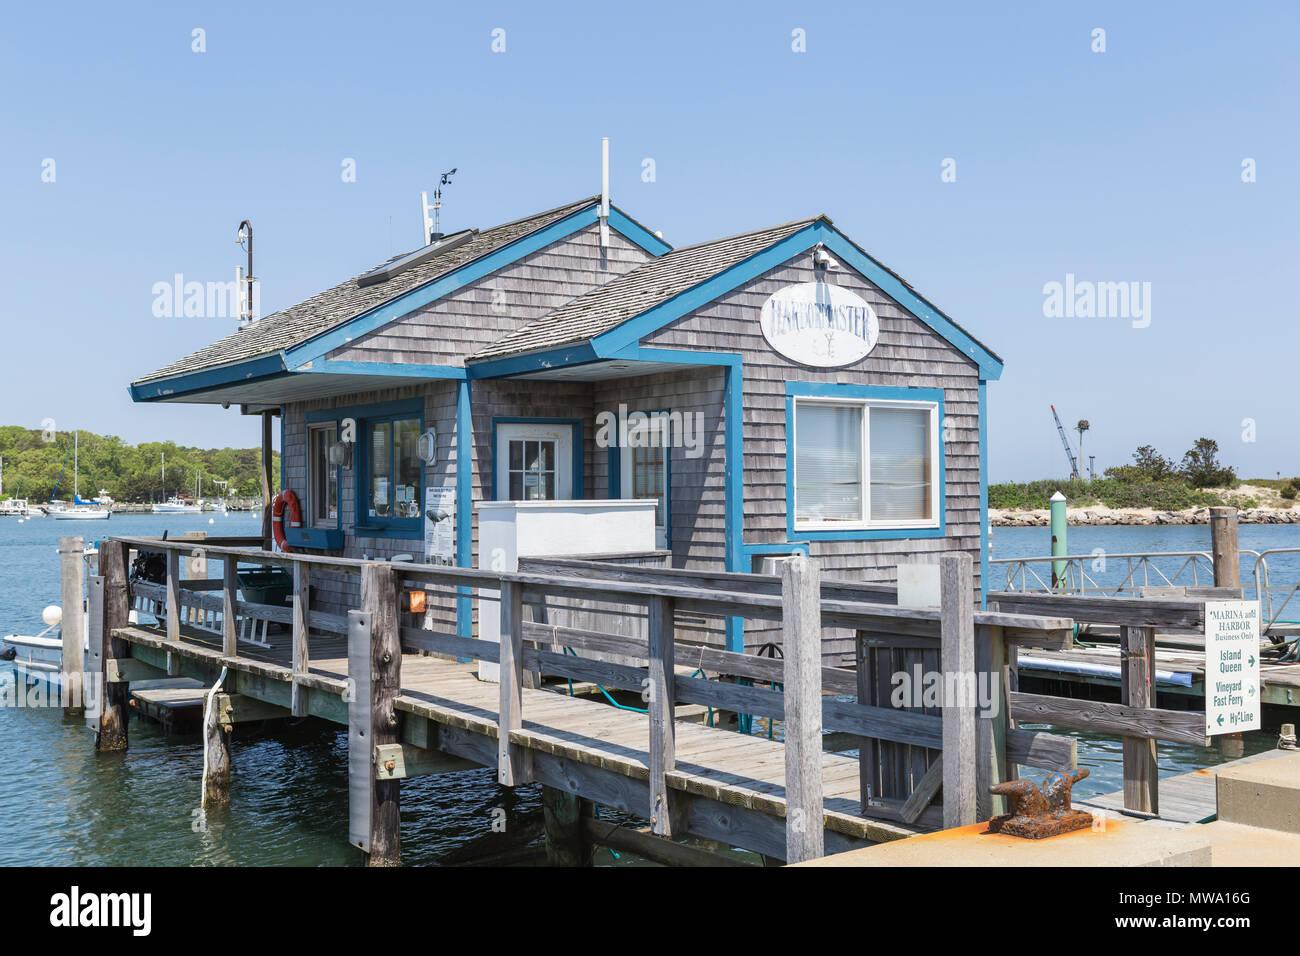 The harbormaster's shack on the marina in Oak Bluffs harbor in Oak Bluffs, Massachusetts on Martha's Vineyard. - Stock Image